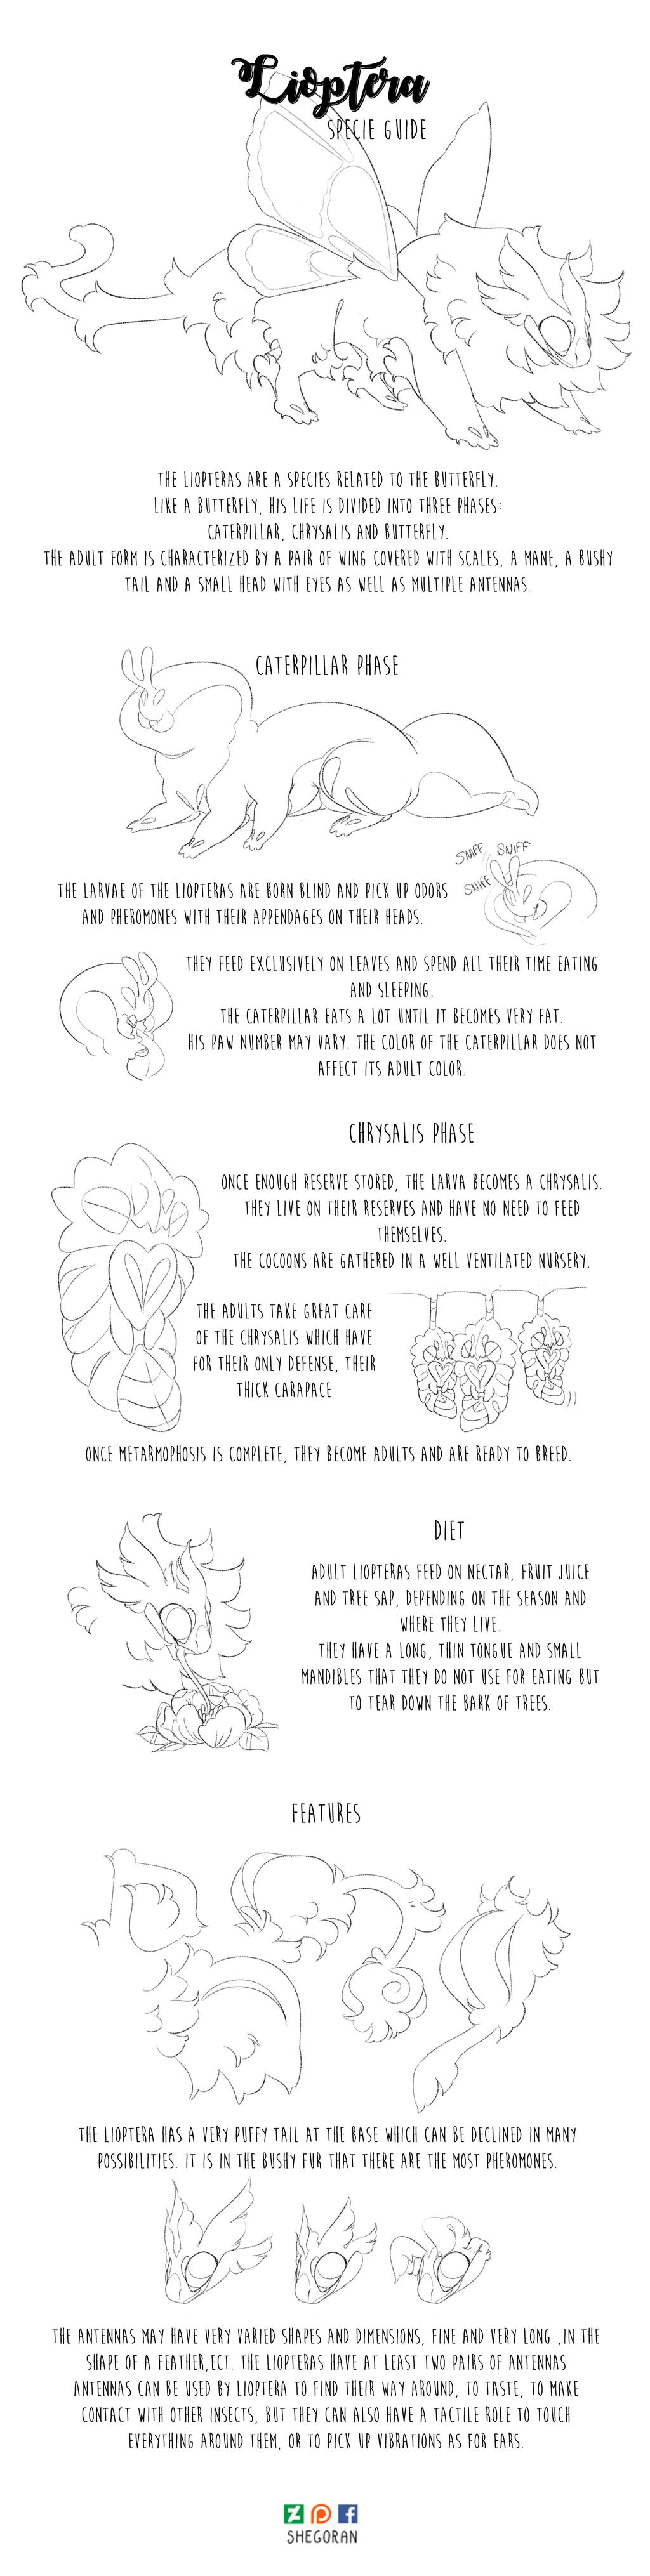 Lioptera specie guide by Shegoran